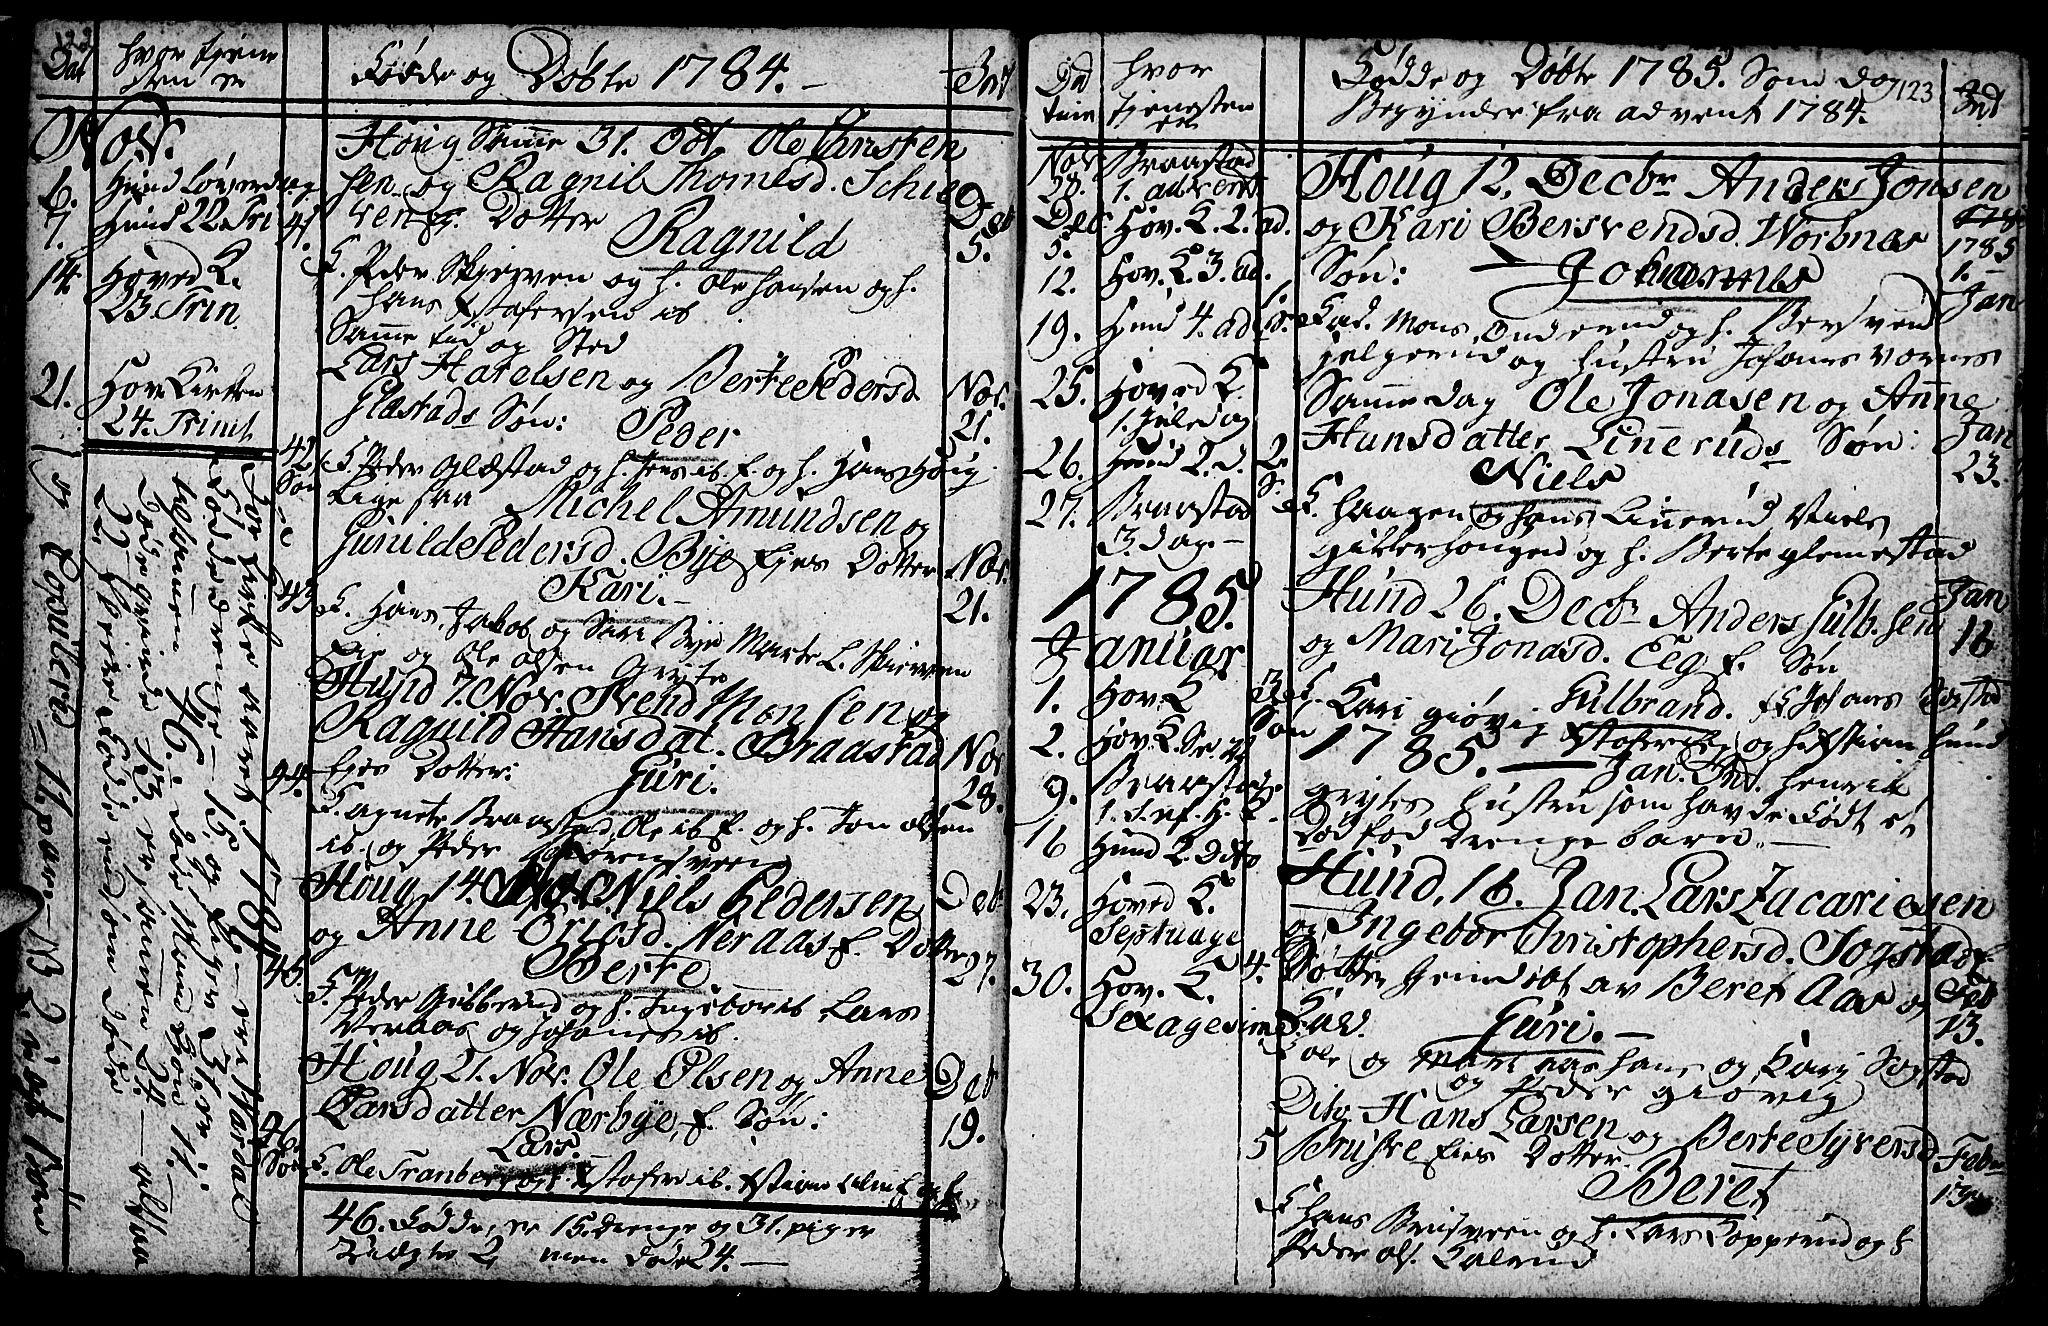 SAH, Vardal prestekontor, H/Ha/Hab/L0001: Klokkerbok nr. 1, 1771-1790, s. 122-123